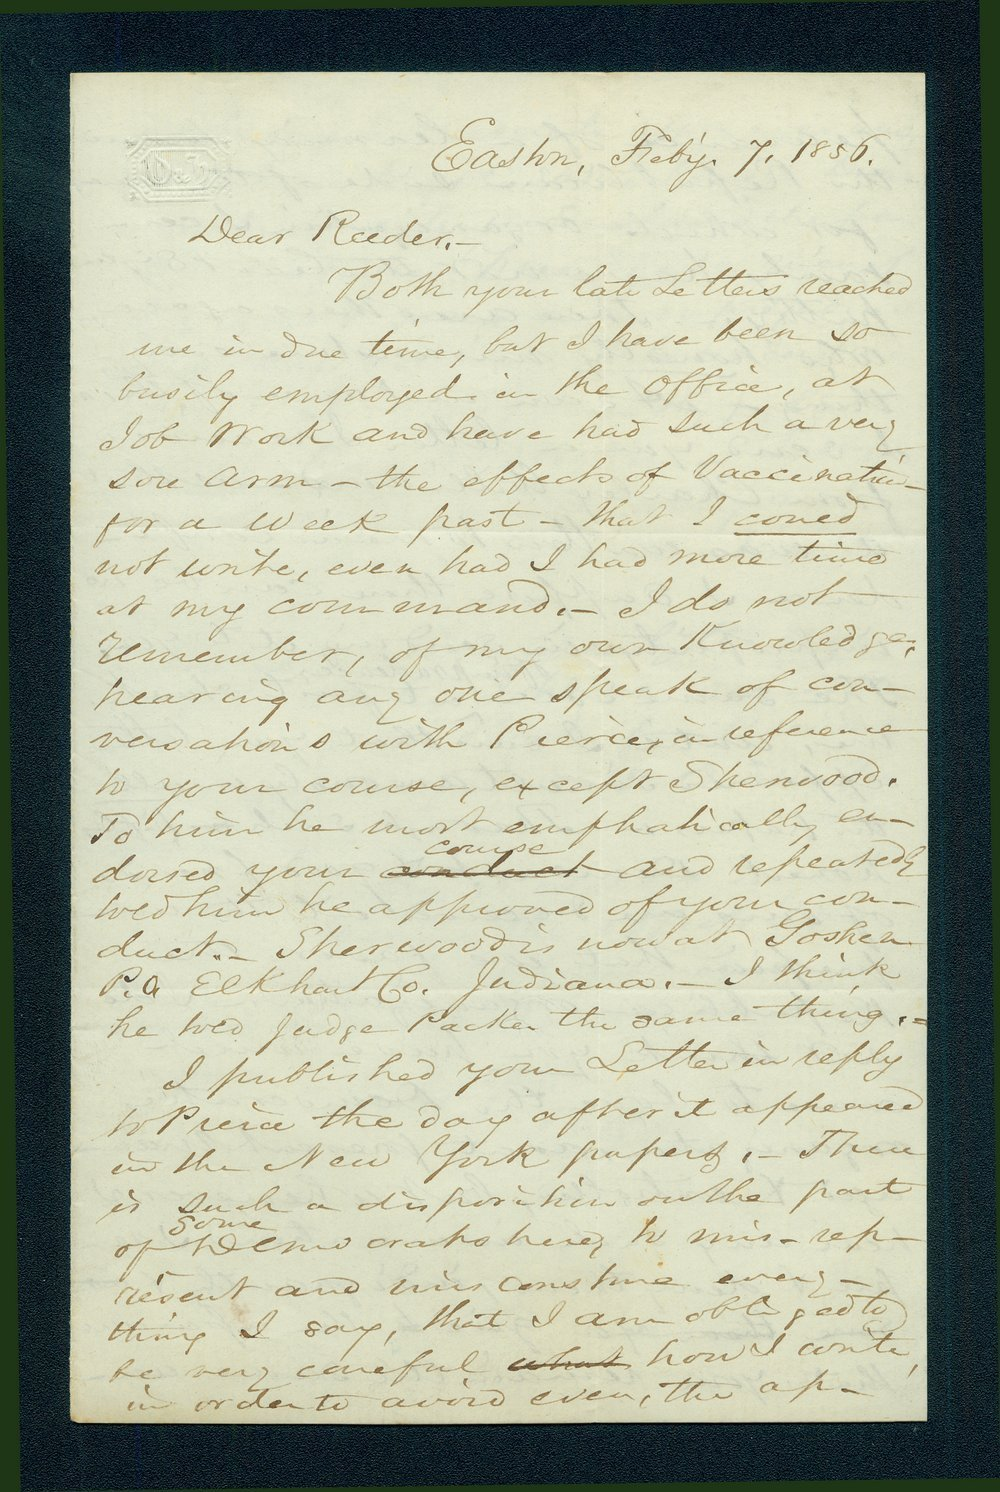 William H. Hutter to Andrew Horatio Reeder - 1